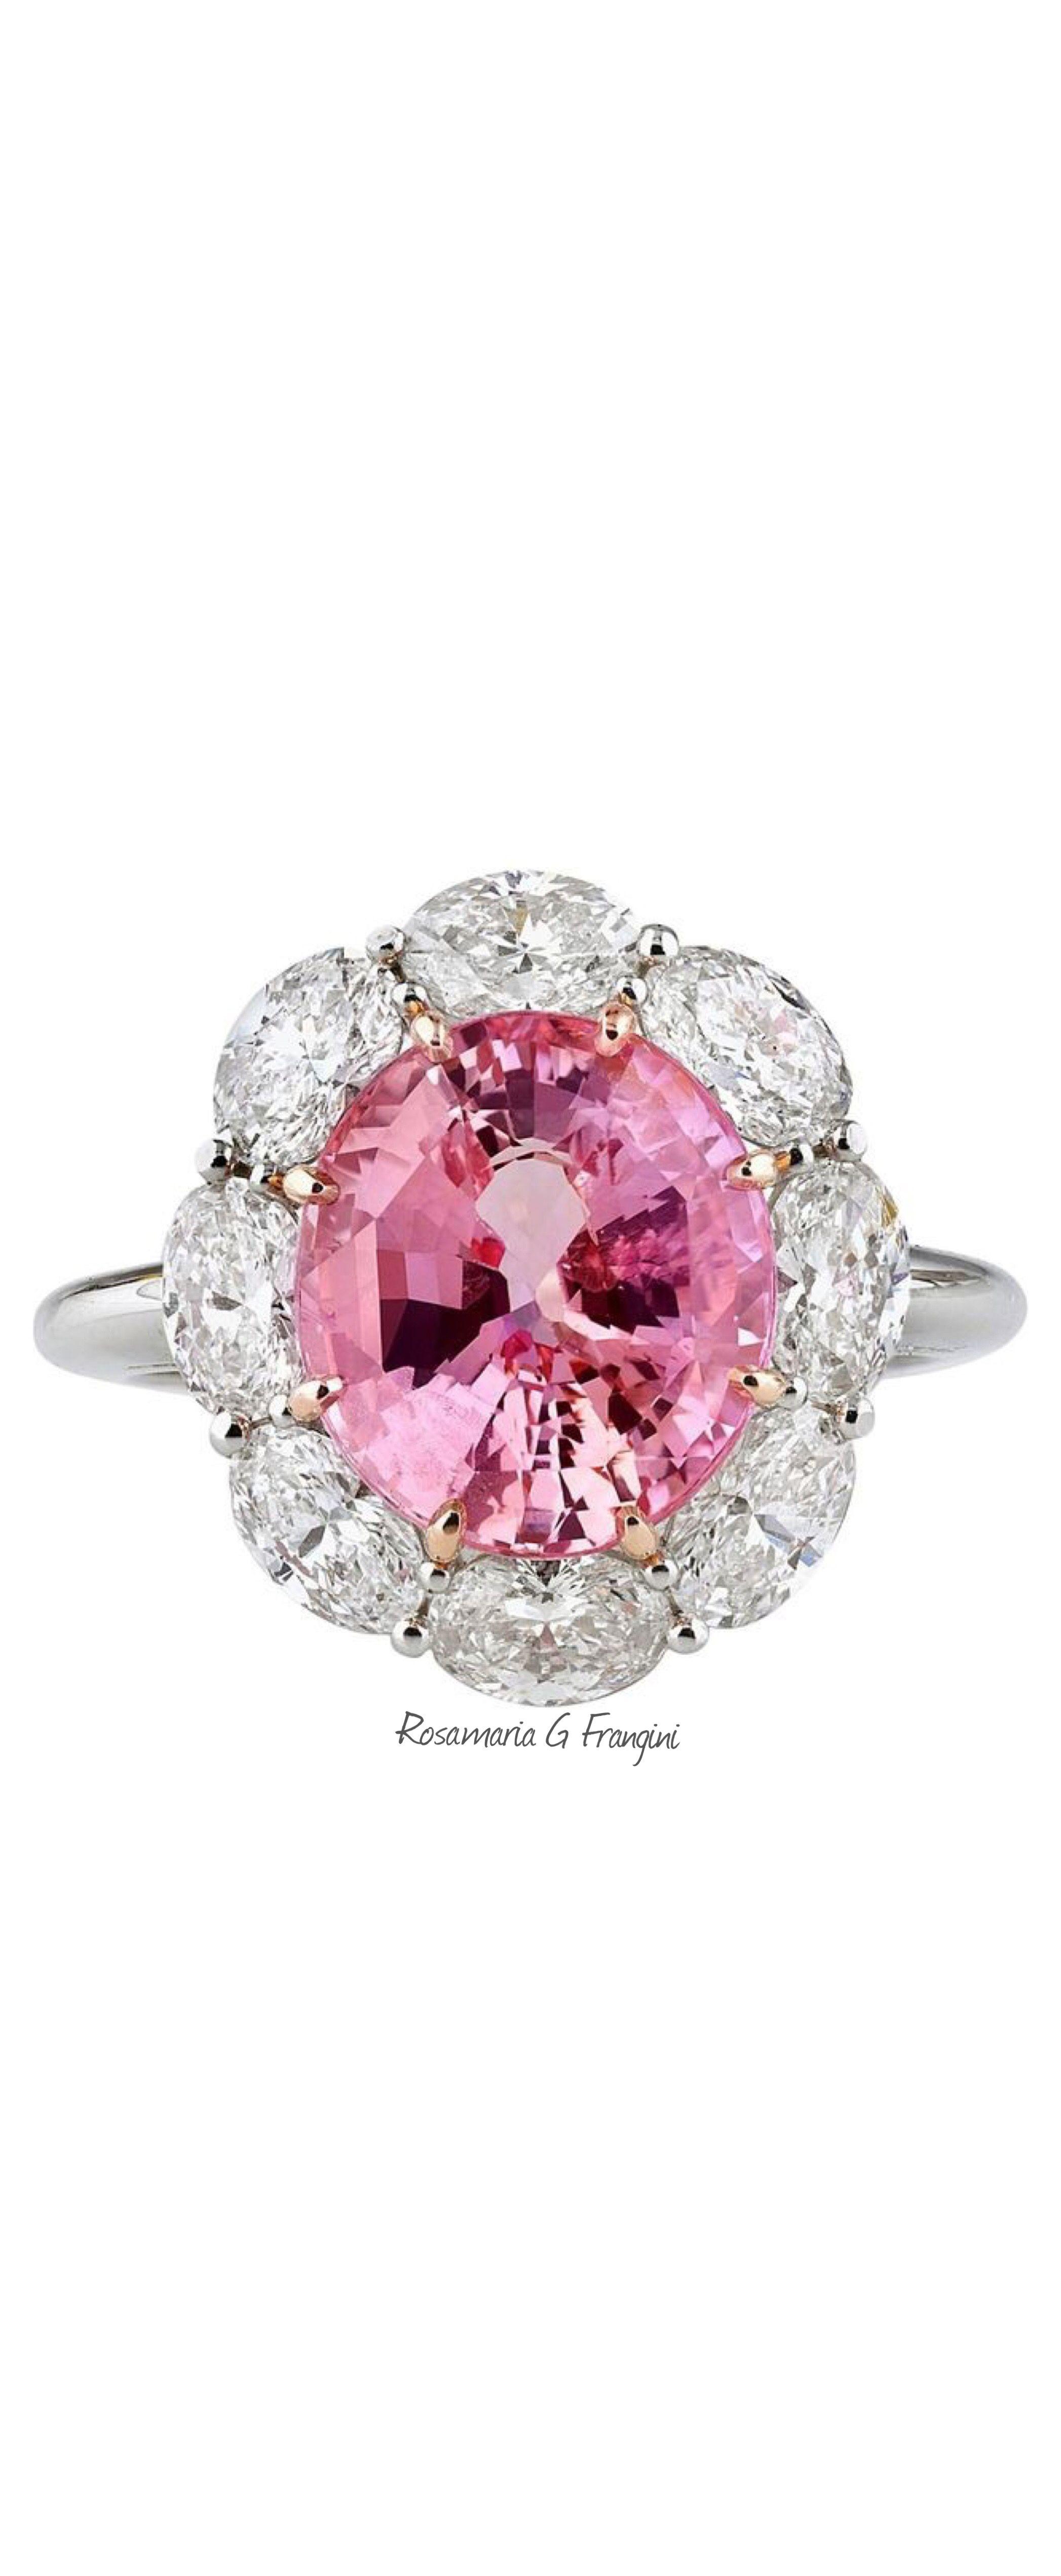 Rosamaria g frangini high pink jewellery carats untreated